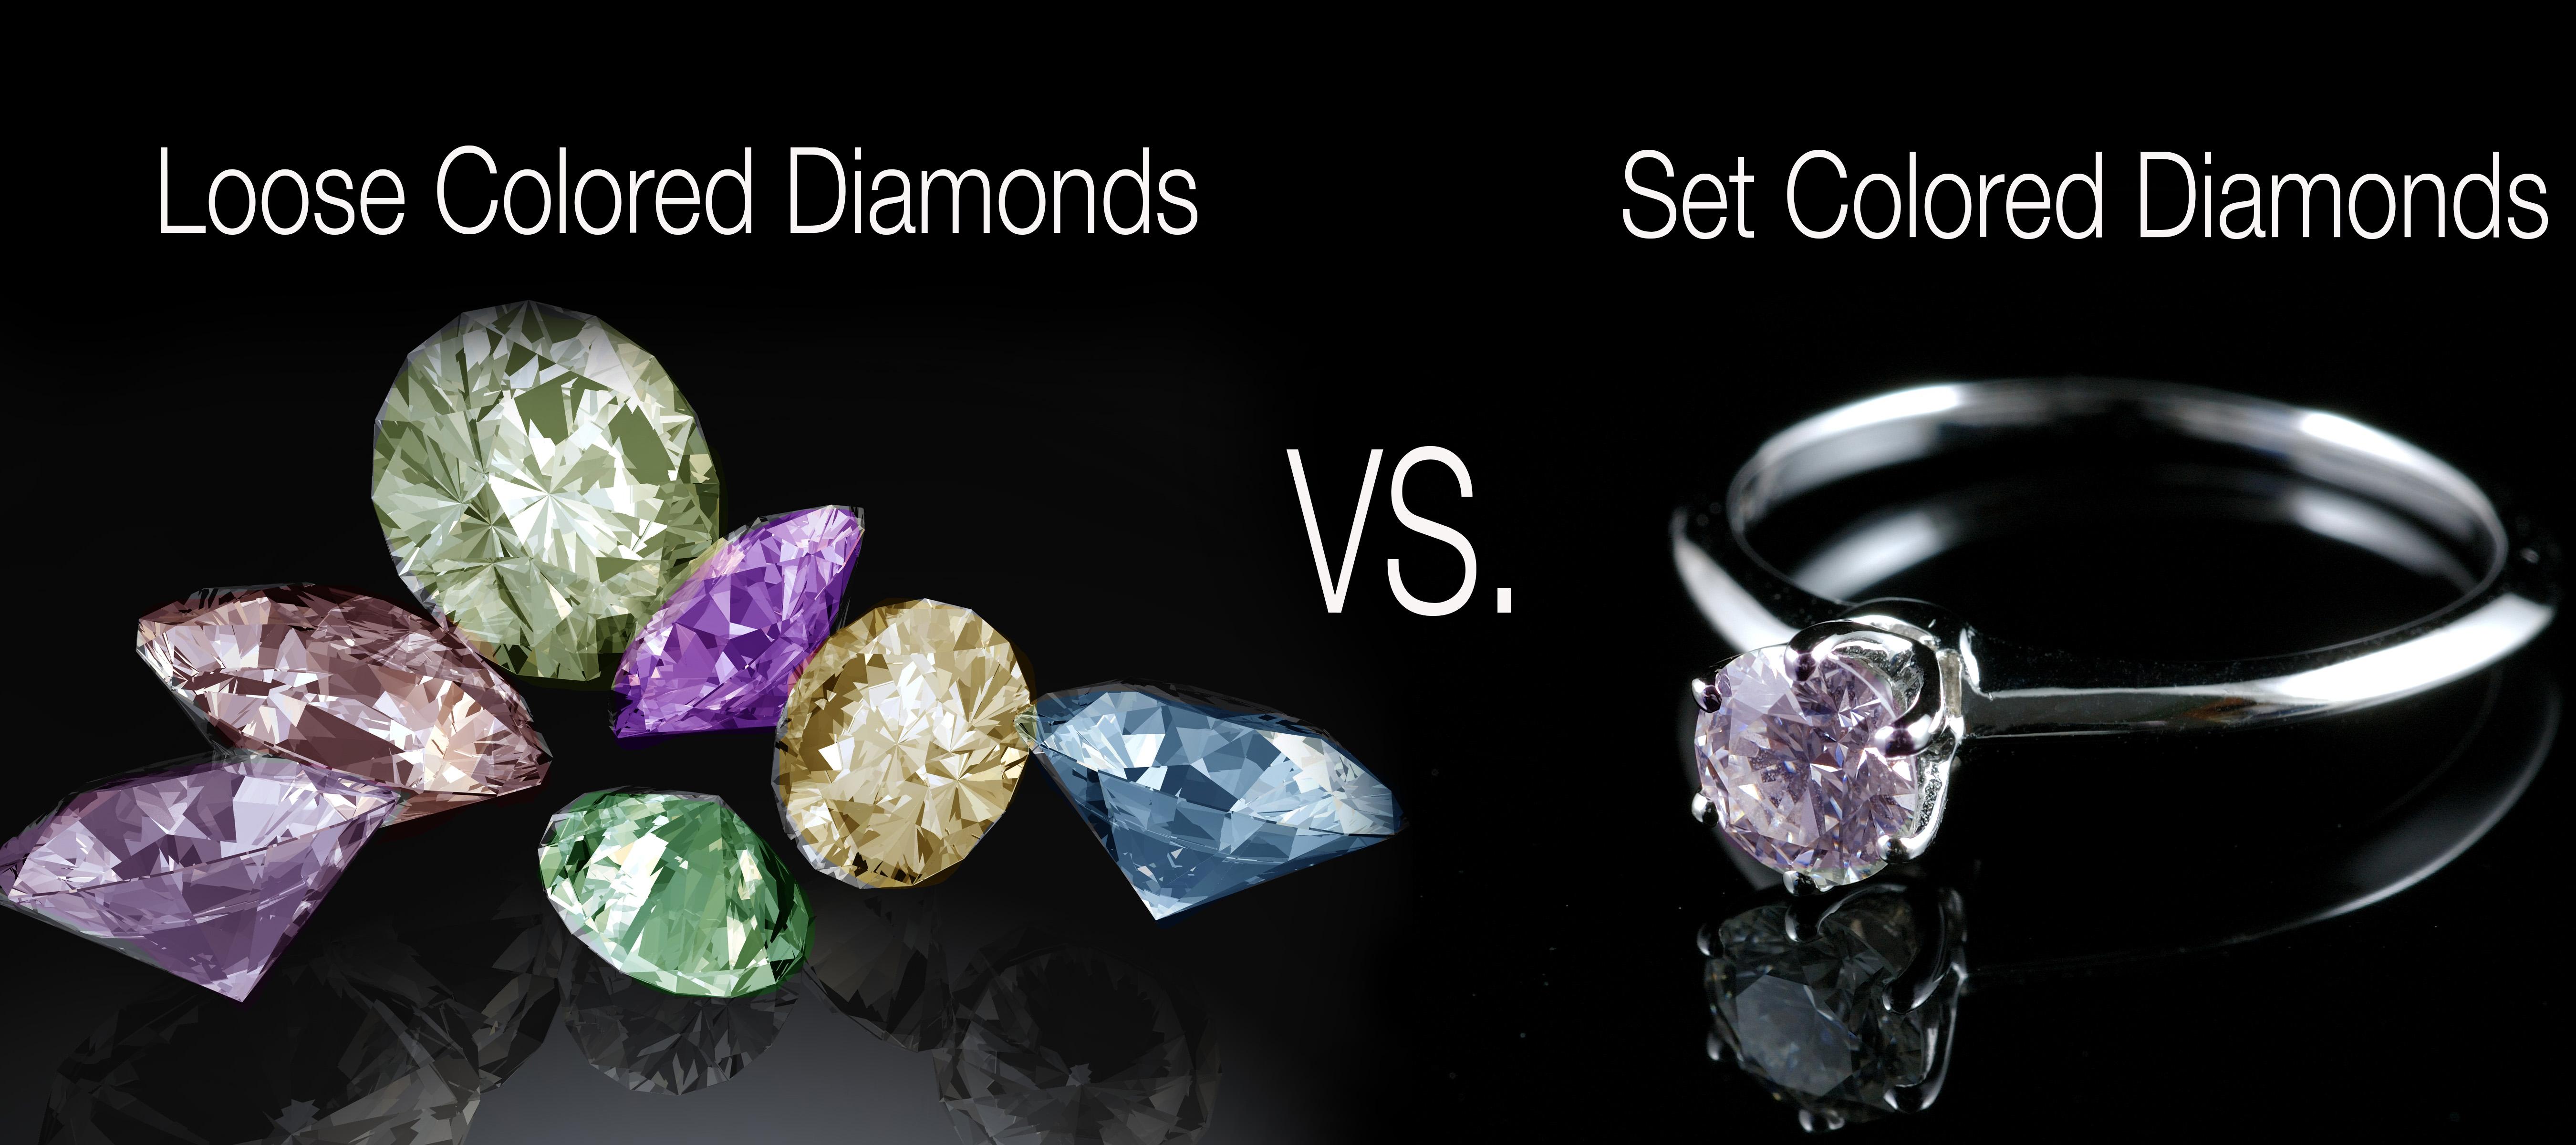 loose_colored_diamonds-4.jpg